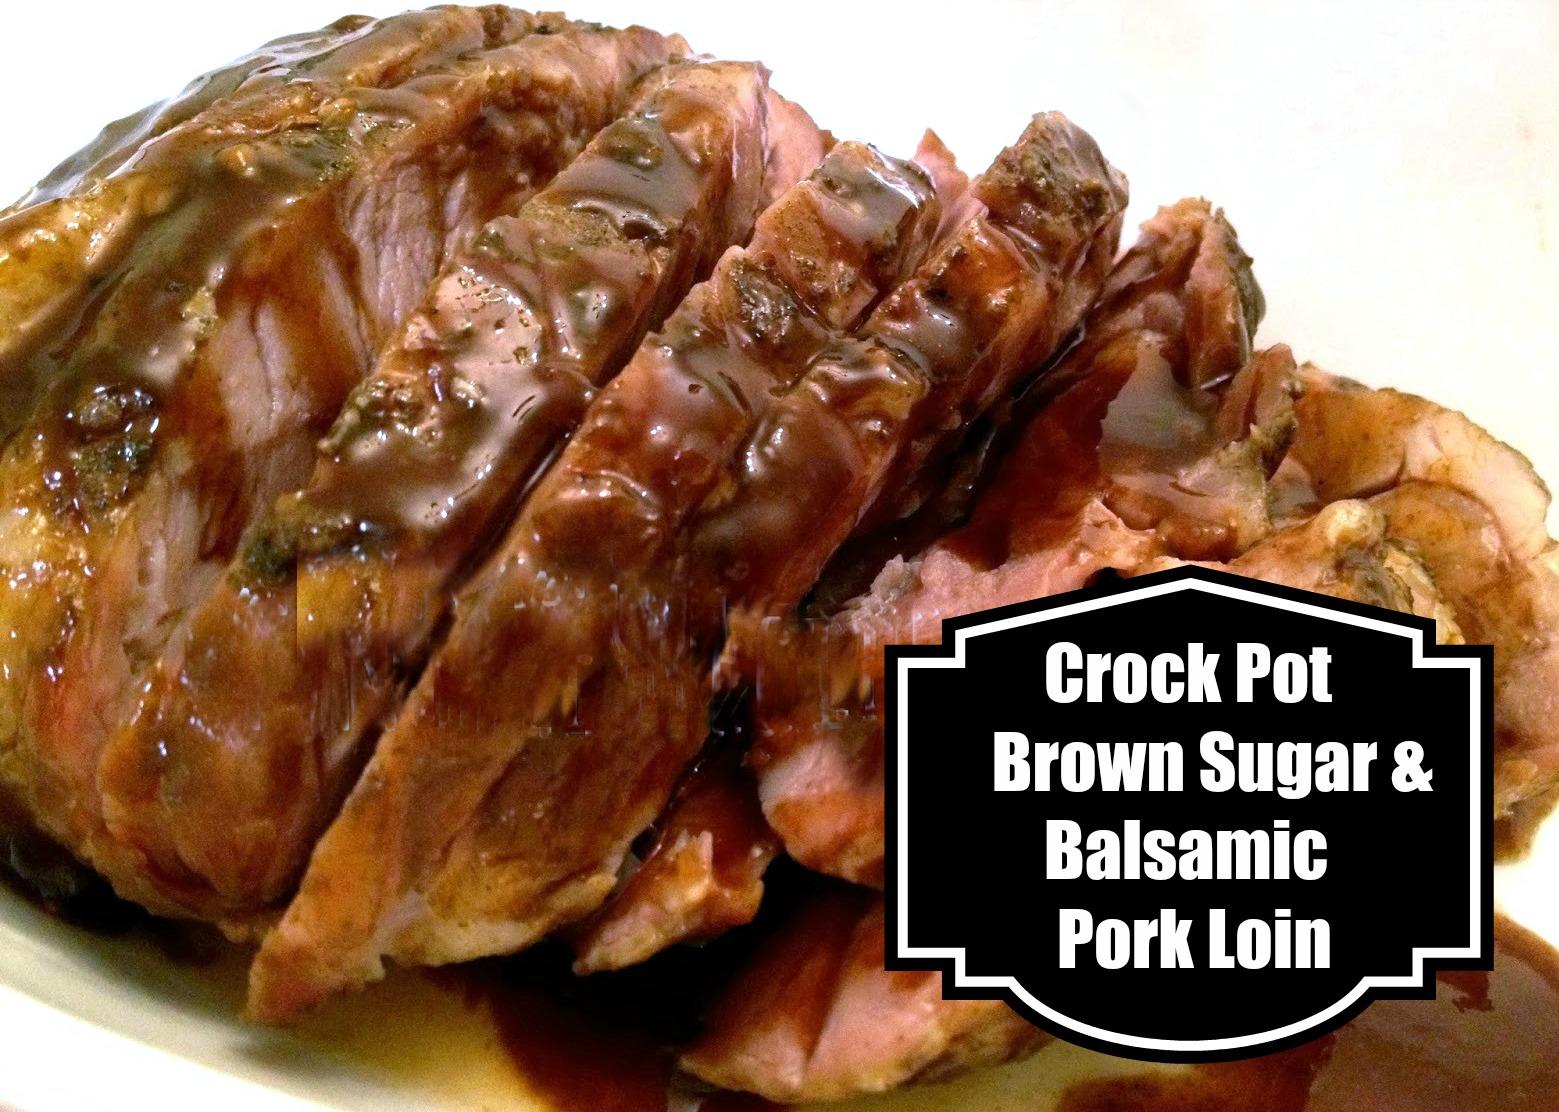 Crock-Pot Brown Sugar and Balsamic Pork Roast